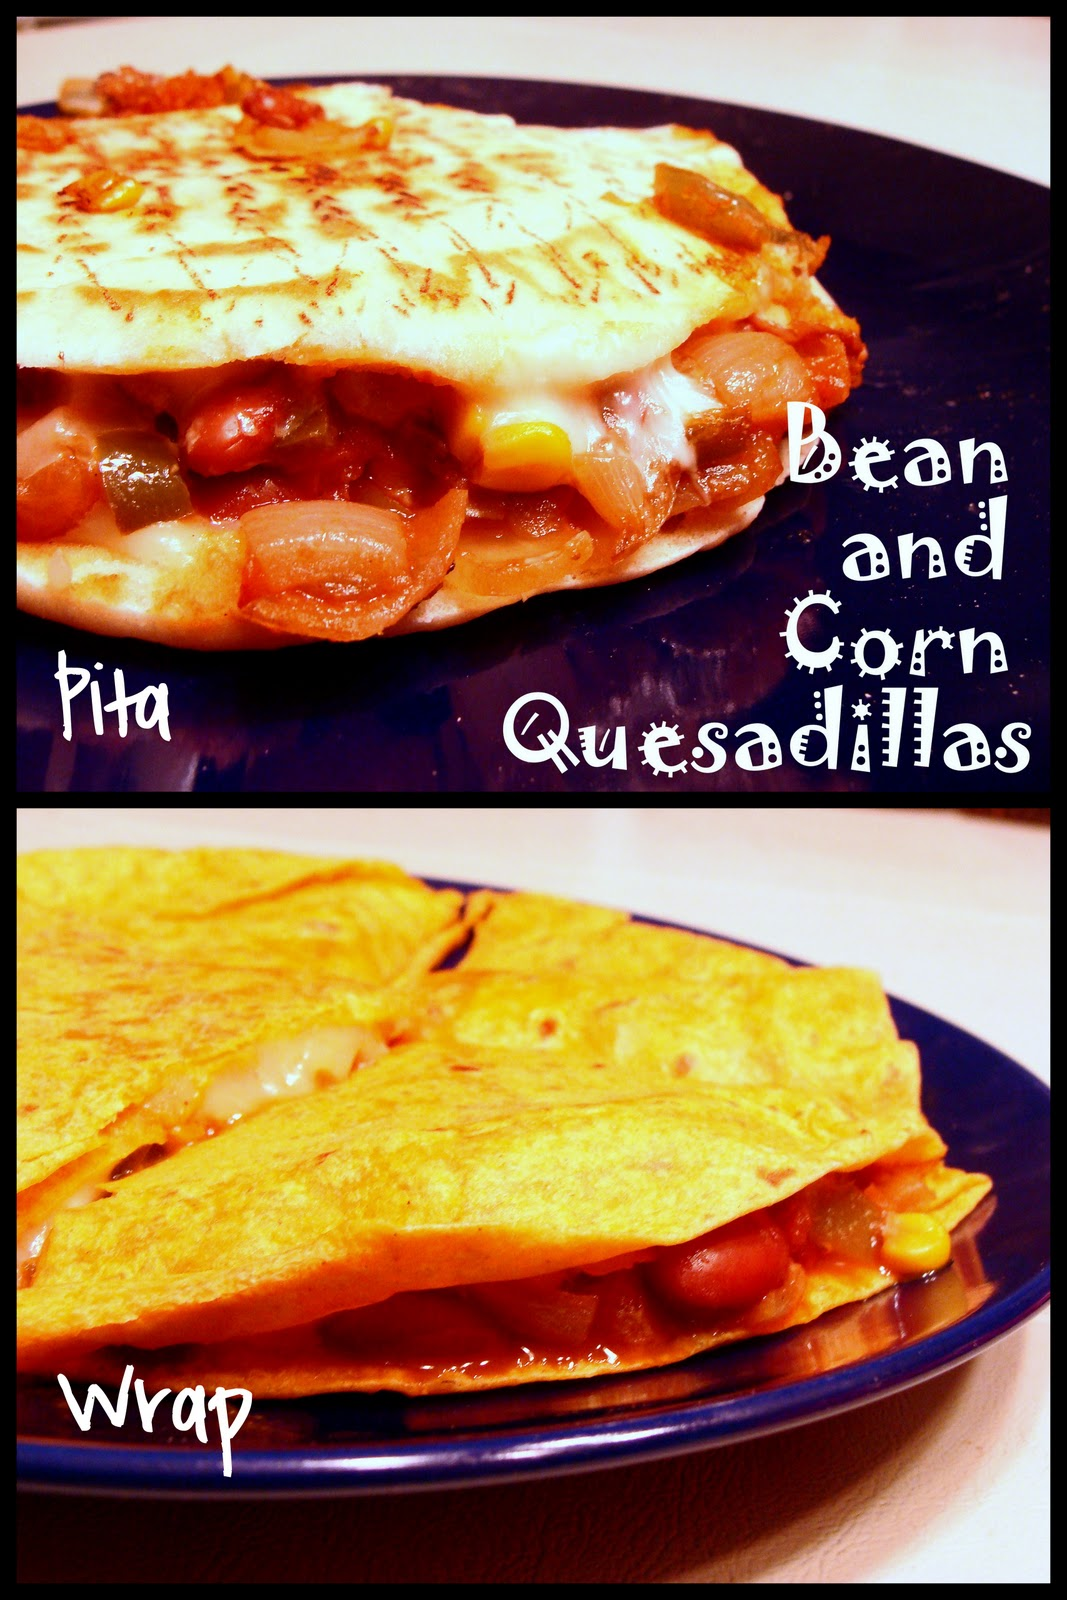 Cantstopbaking: Bean and Corn Quesadillas